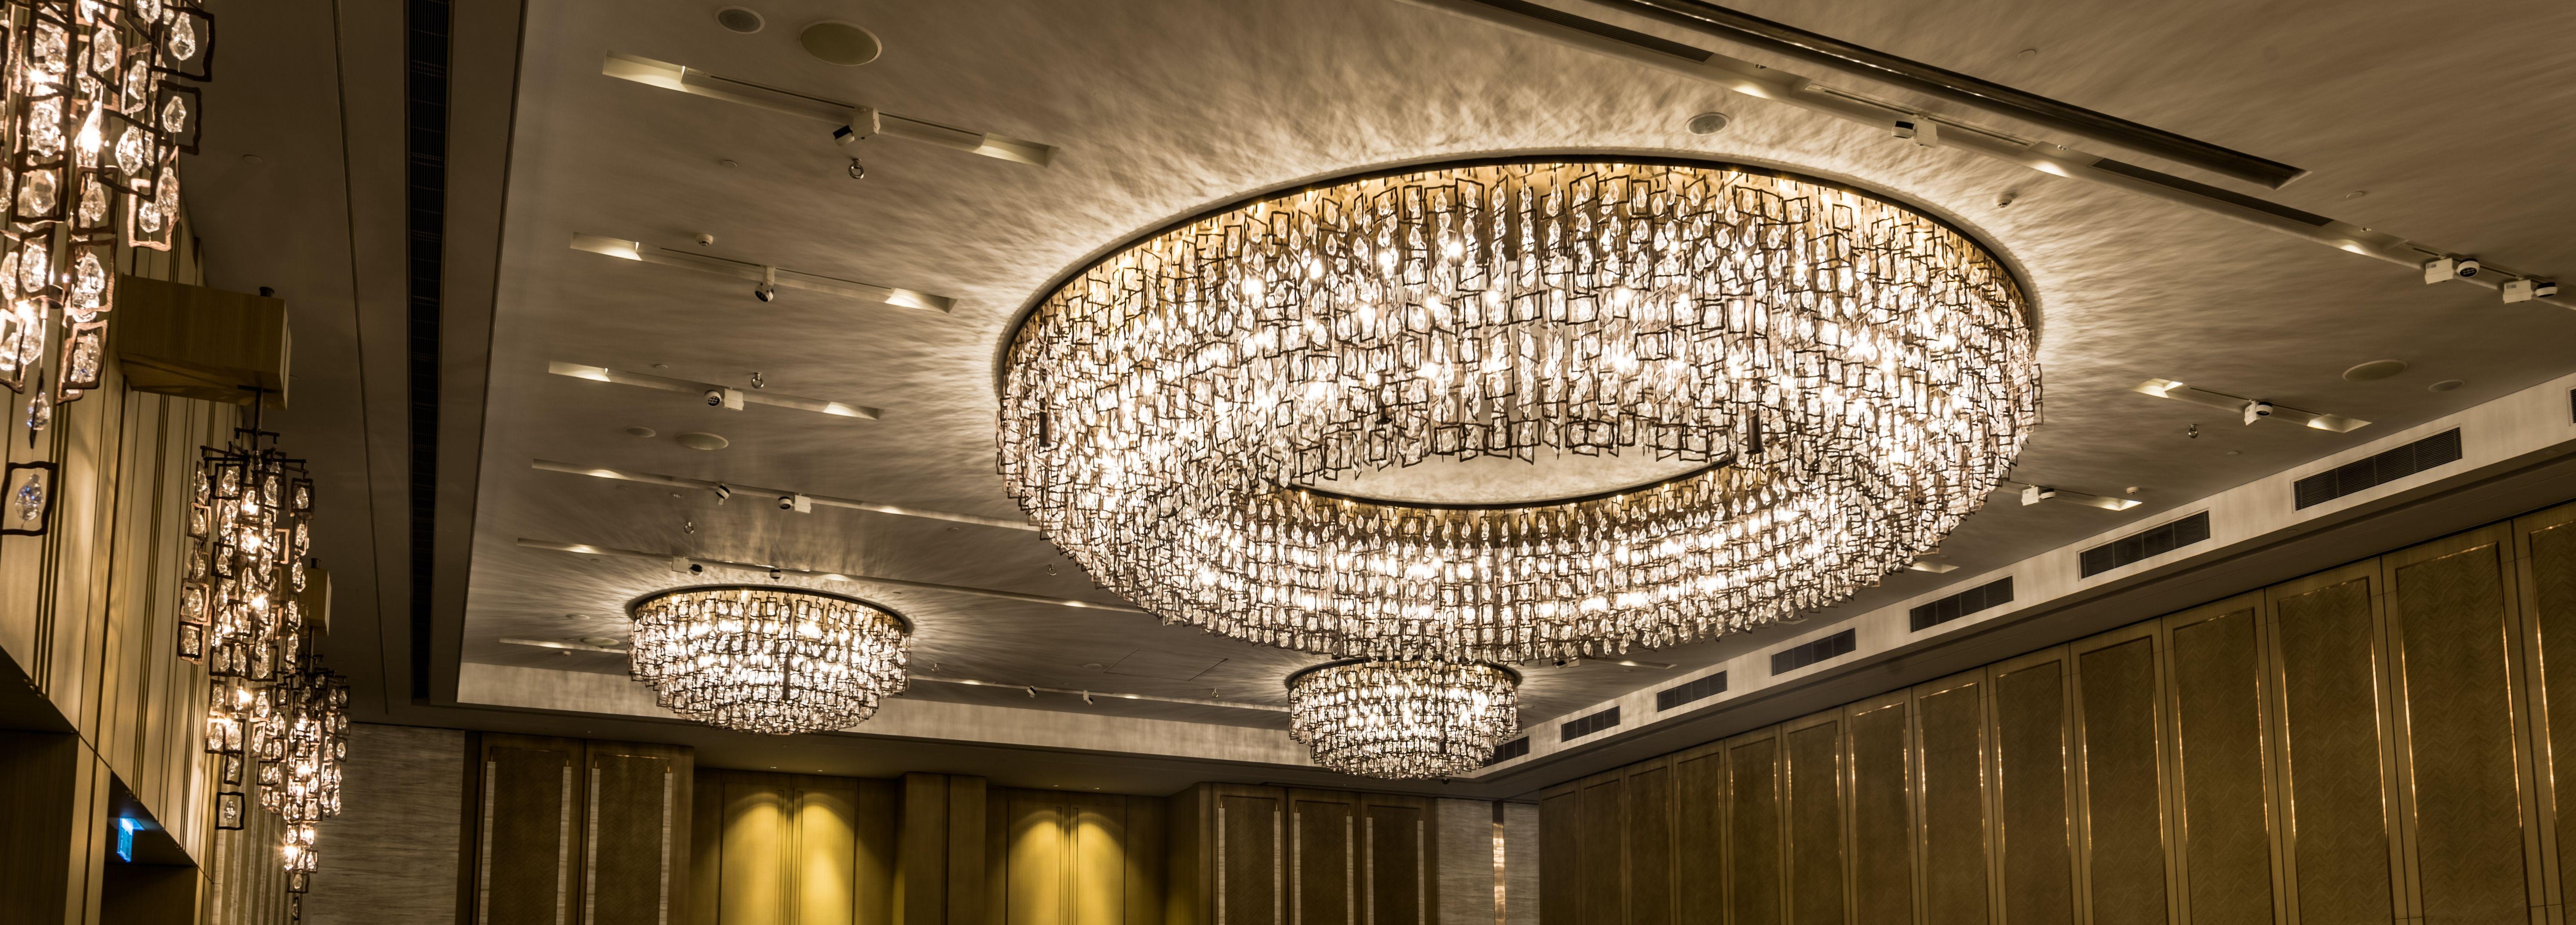 Elegant Decorative Design Compliments The Grand Ballroom At Kerry